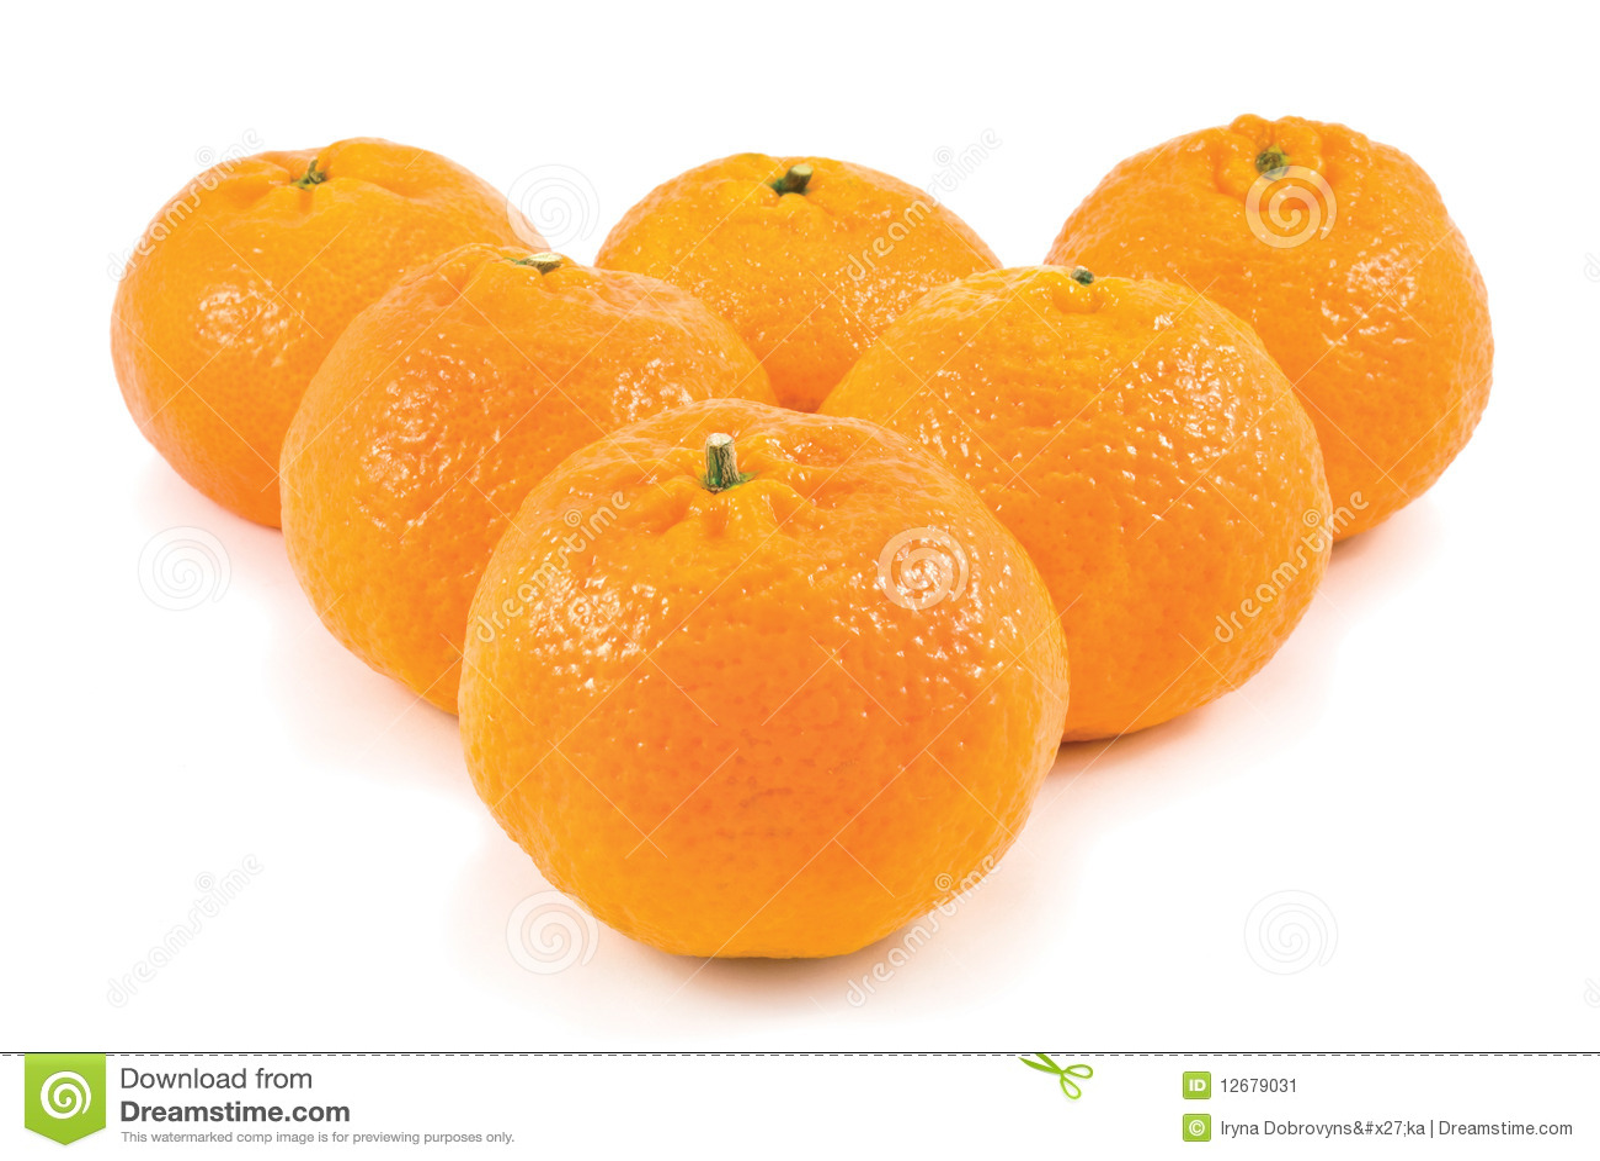 how to keep tangerines fresh